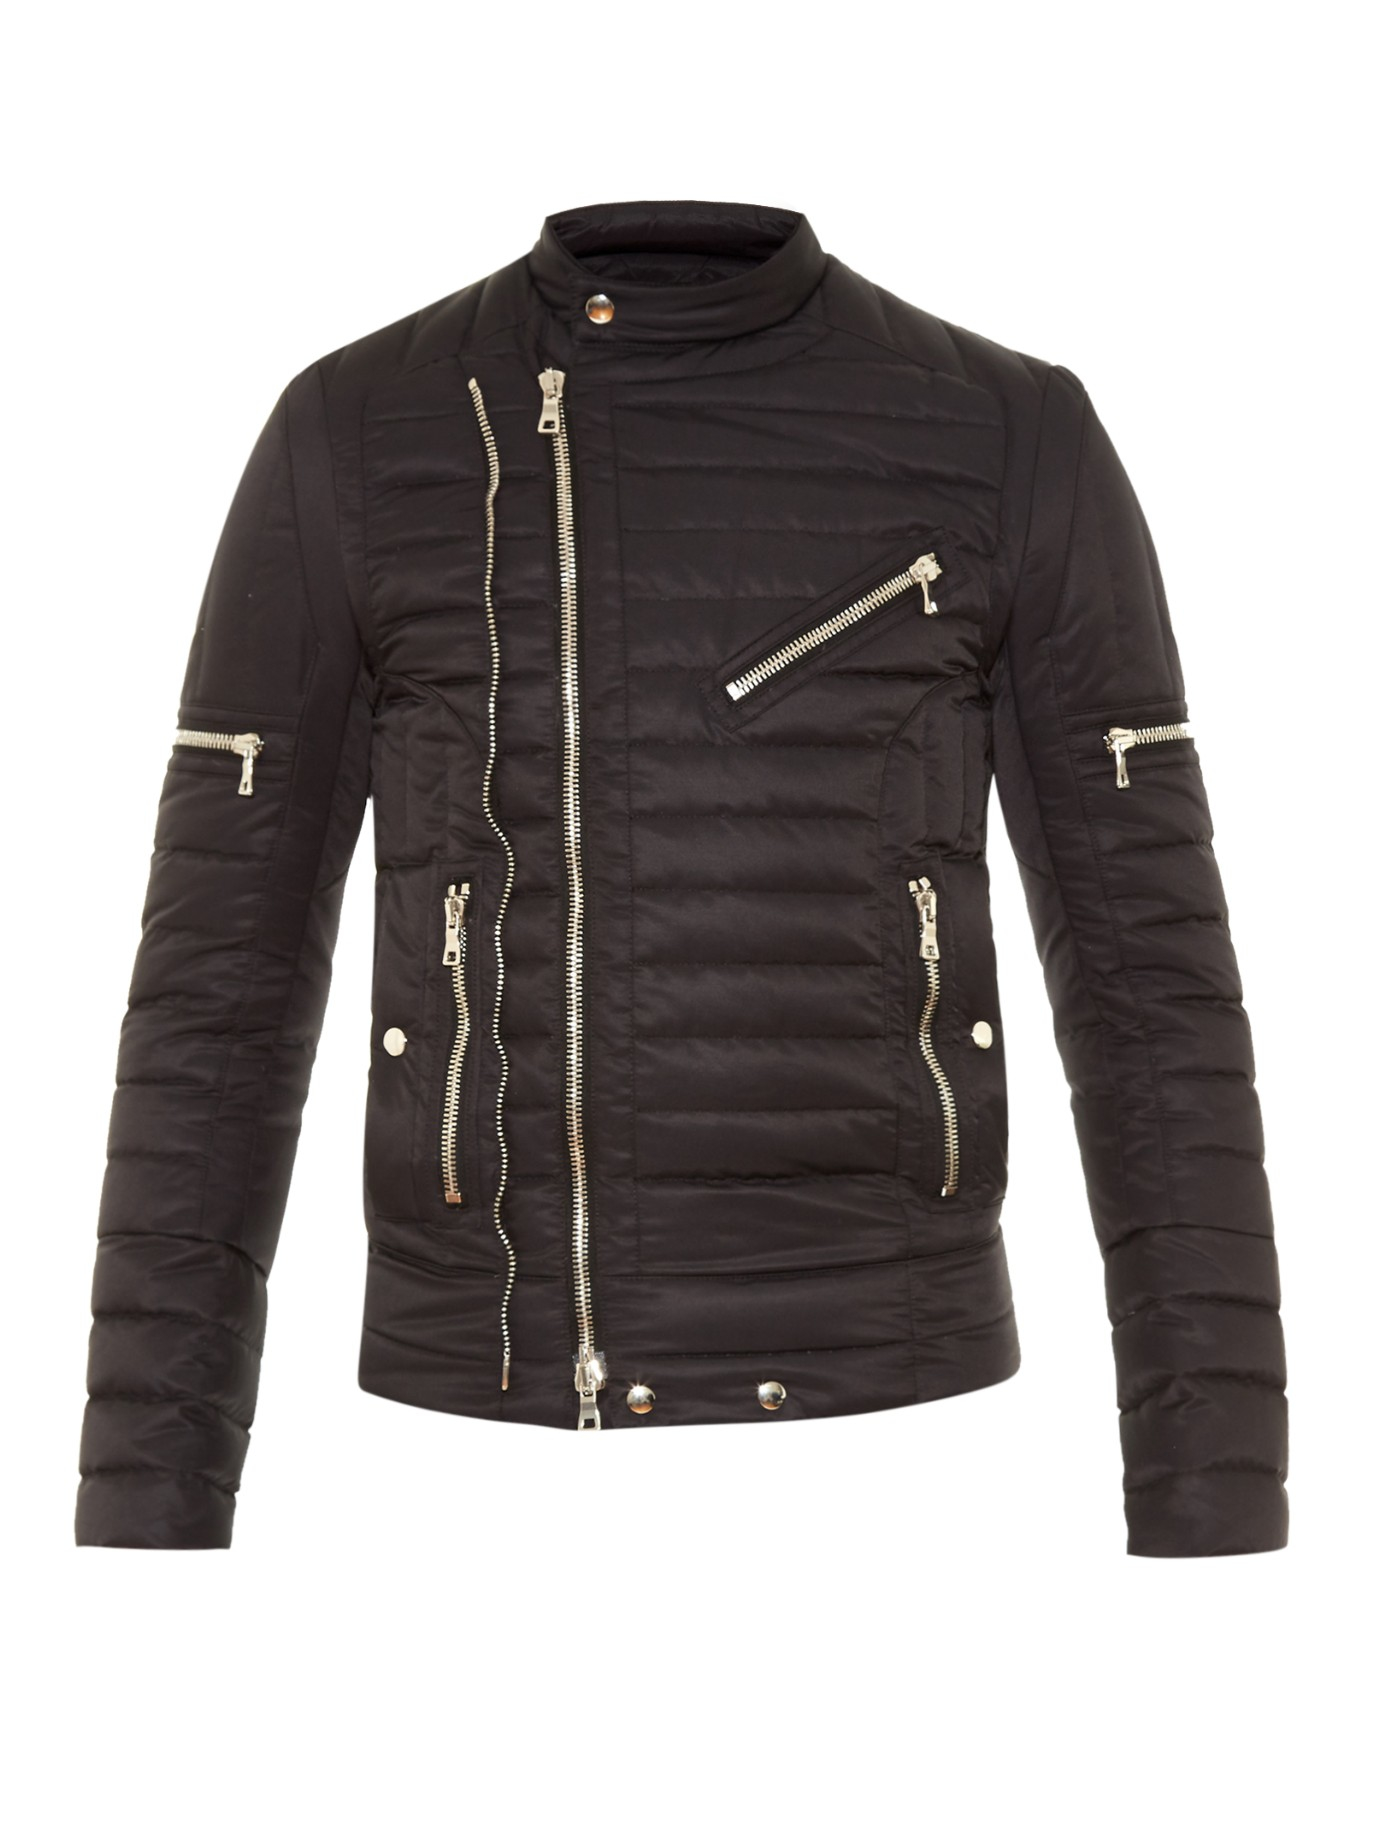 Balmain Quilted Down Biker Jacket In Black For Men Lyst